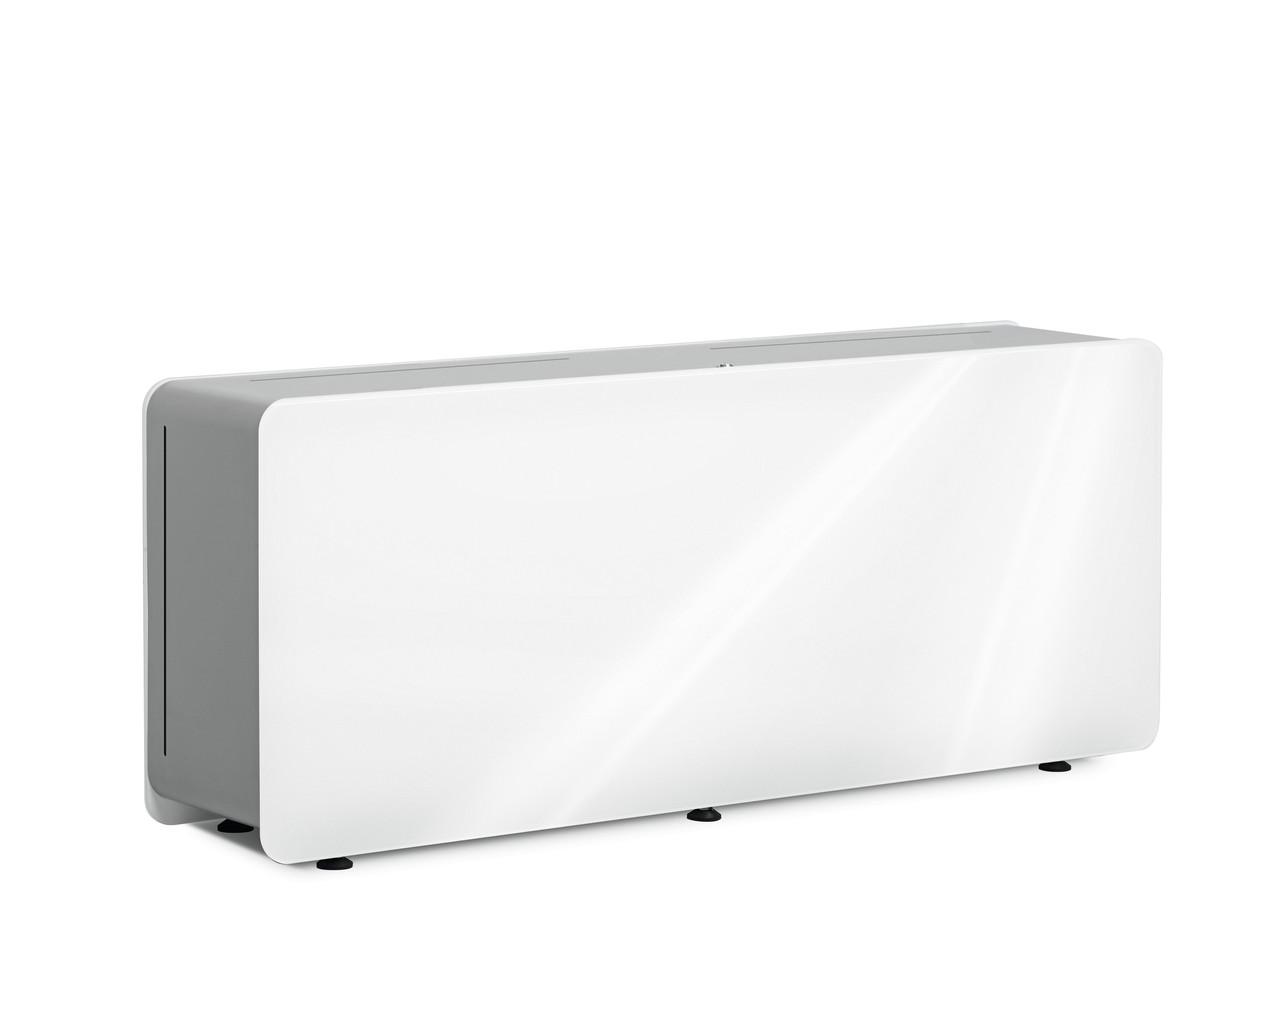 Тумба Vogels PVW 4012 к мобильным стойкам цвет - белый